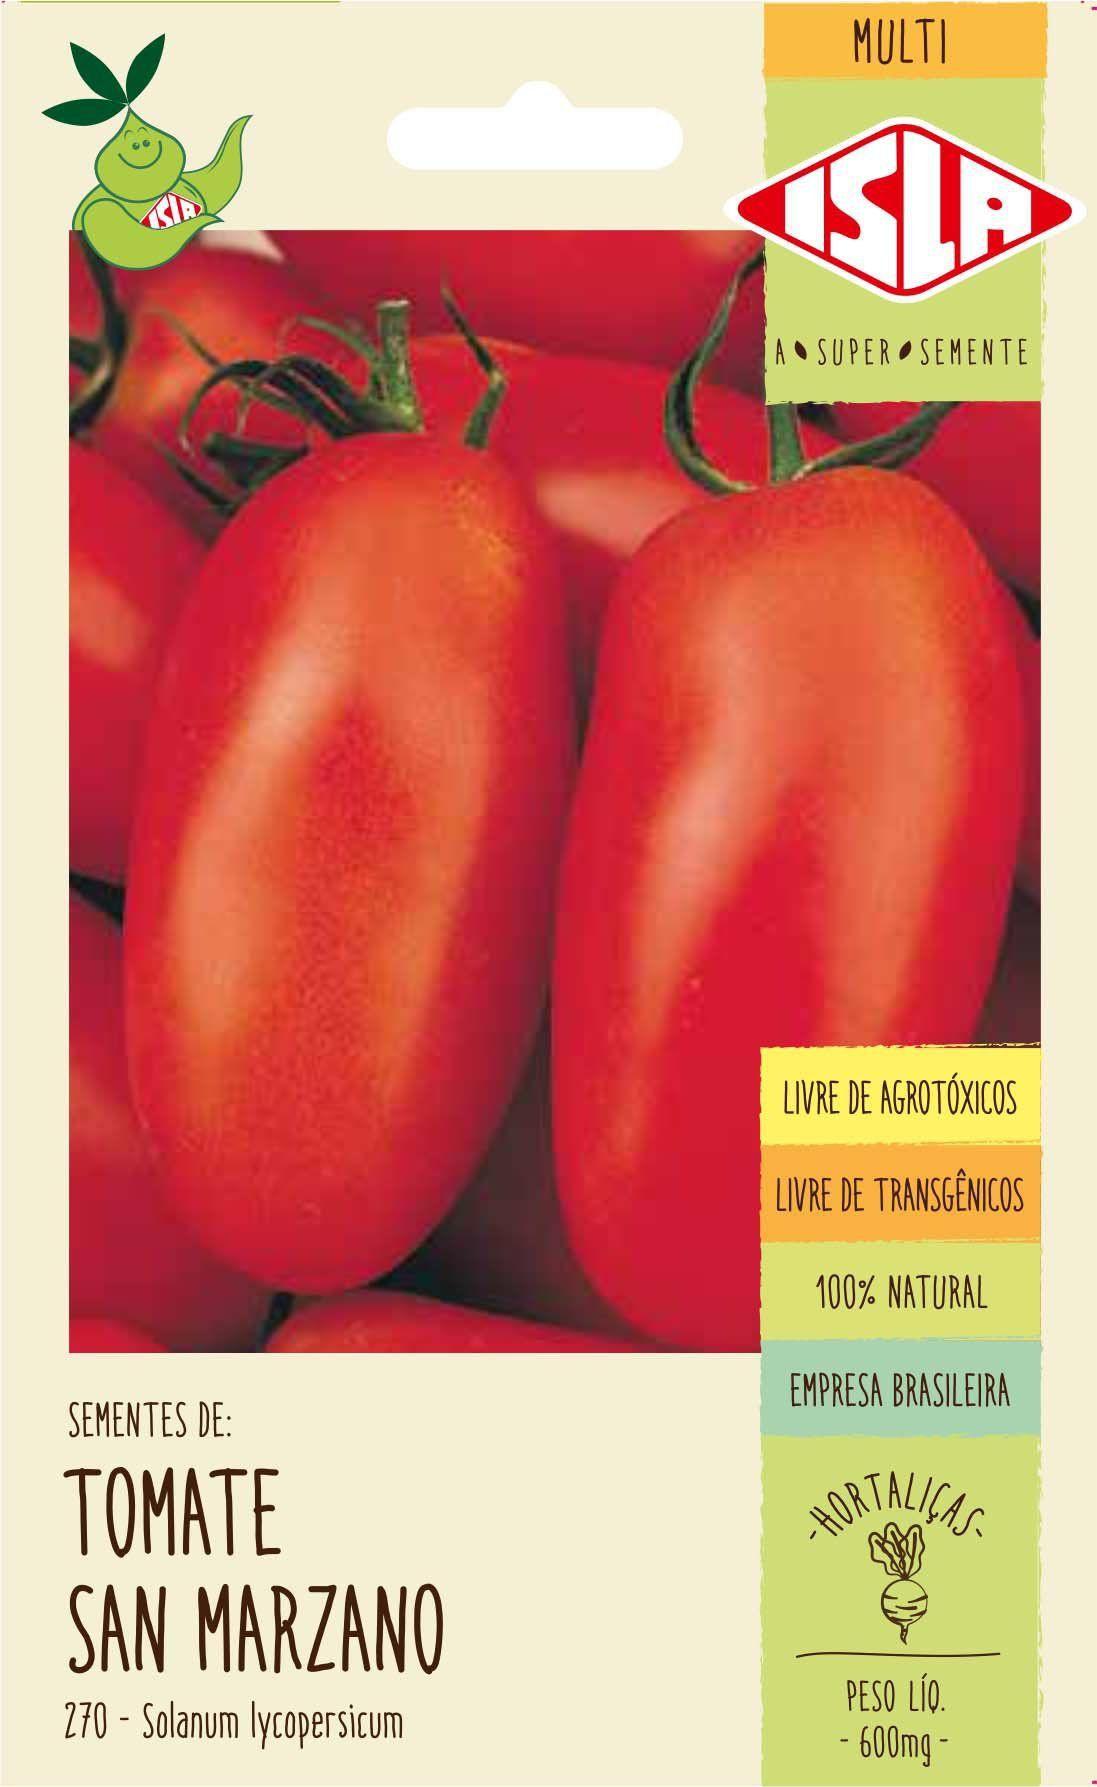 Sementes de Tomate San Marzano 600mg - Isla Multi